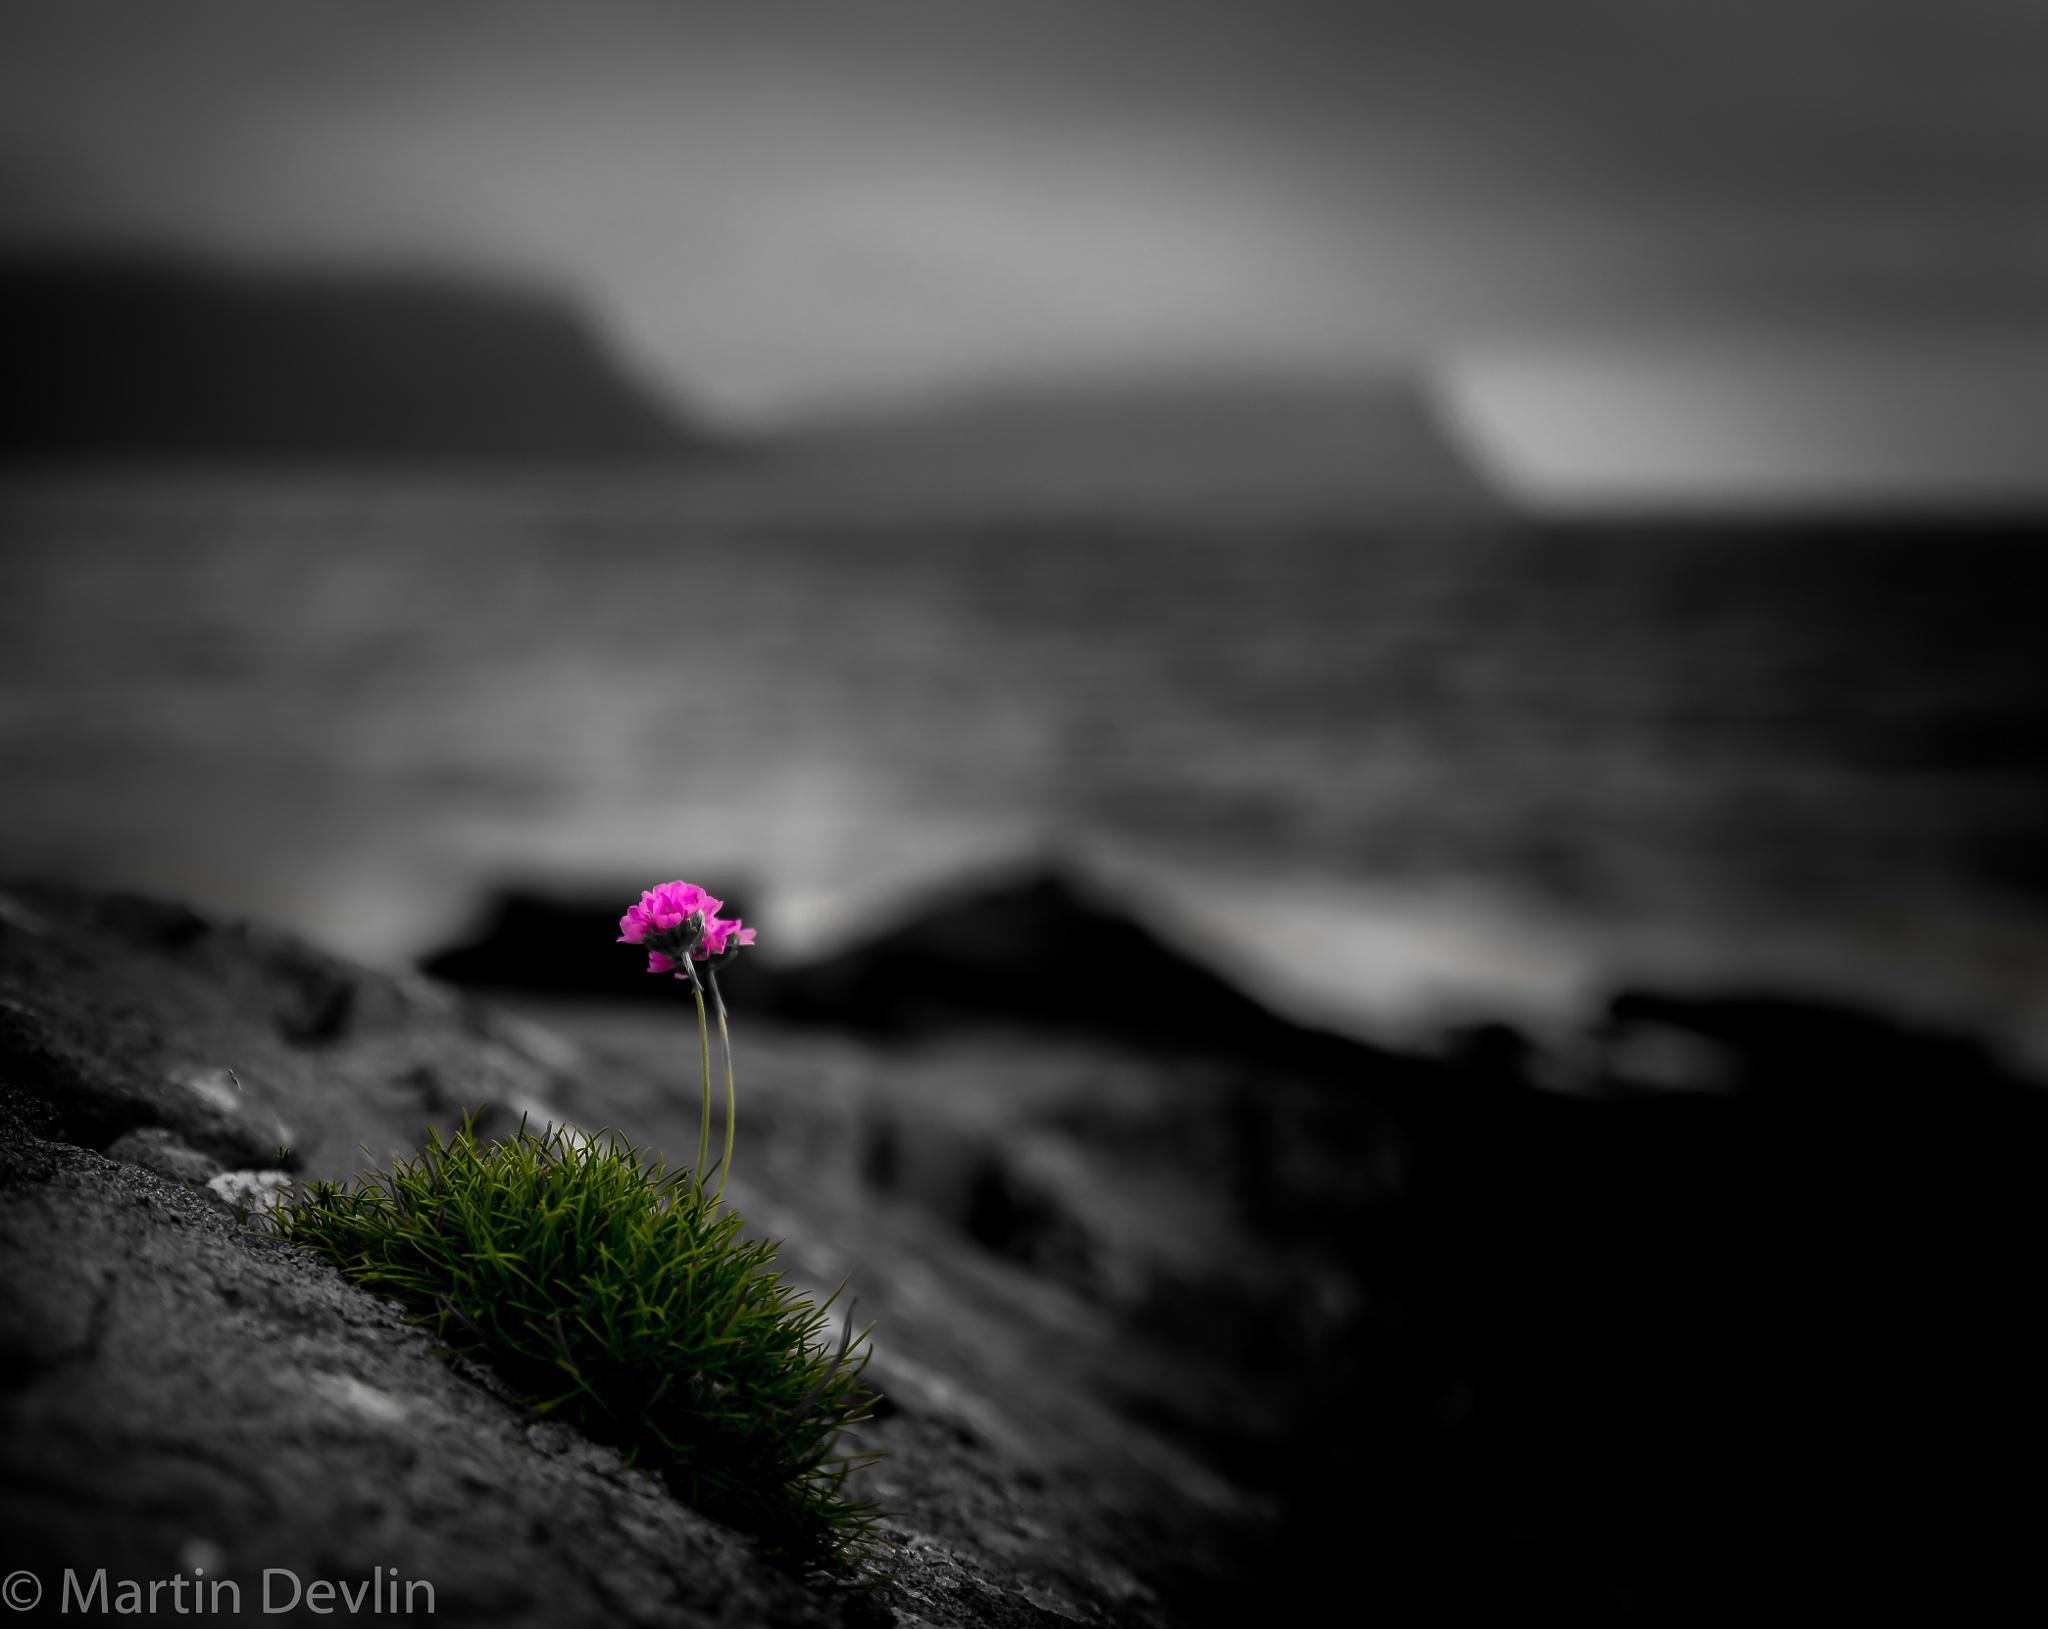 The Pink Flower by Martin Devlin